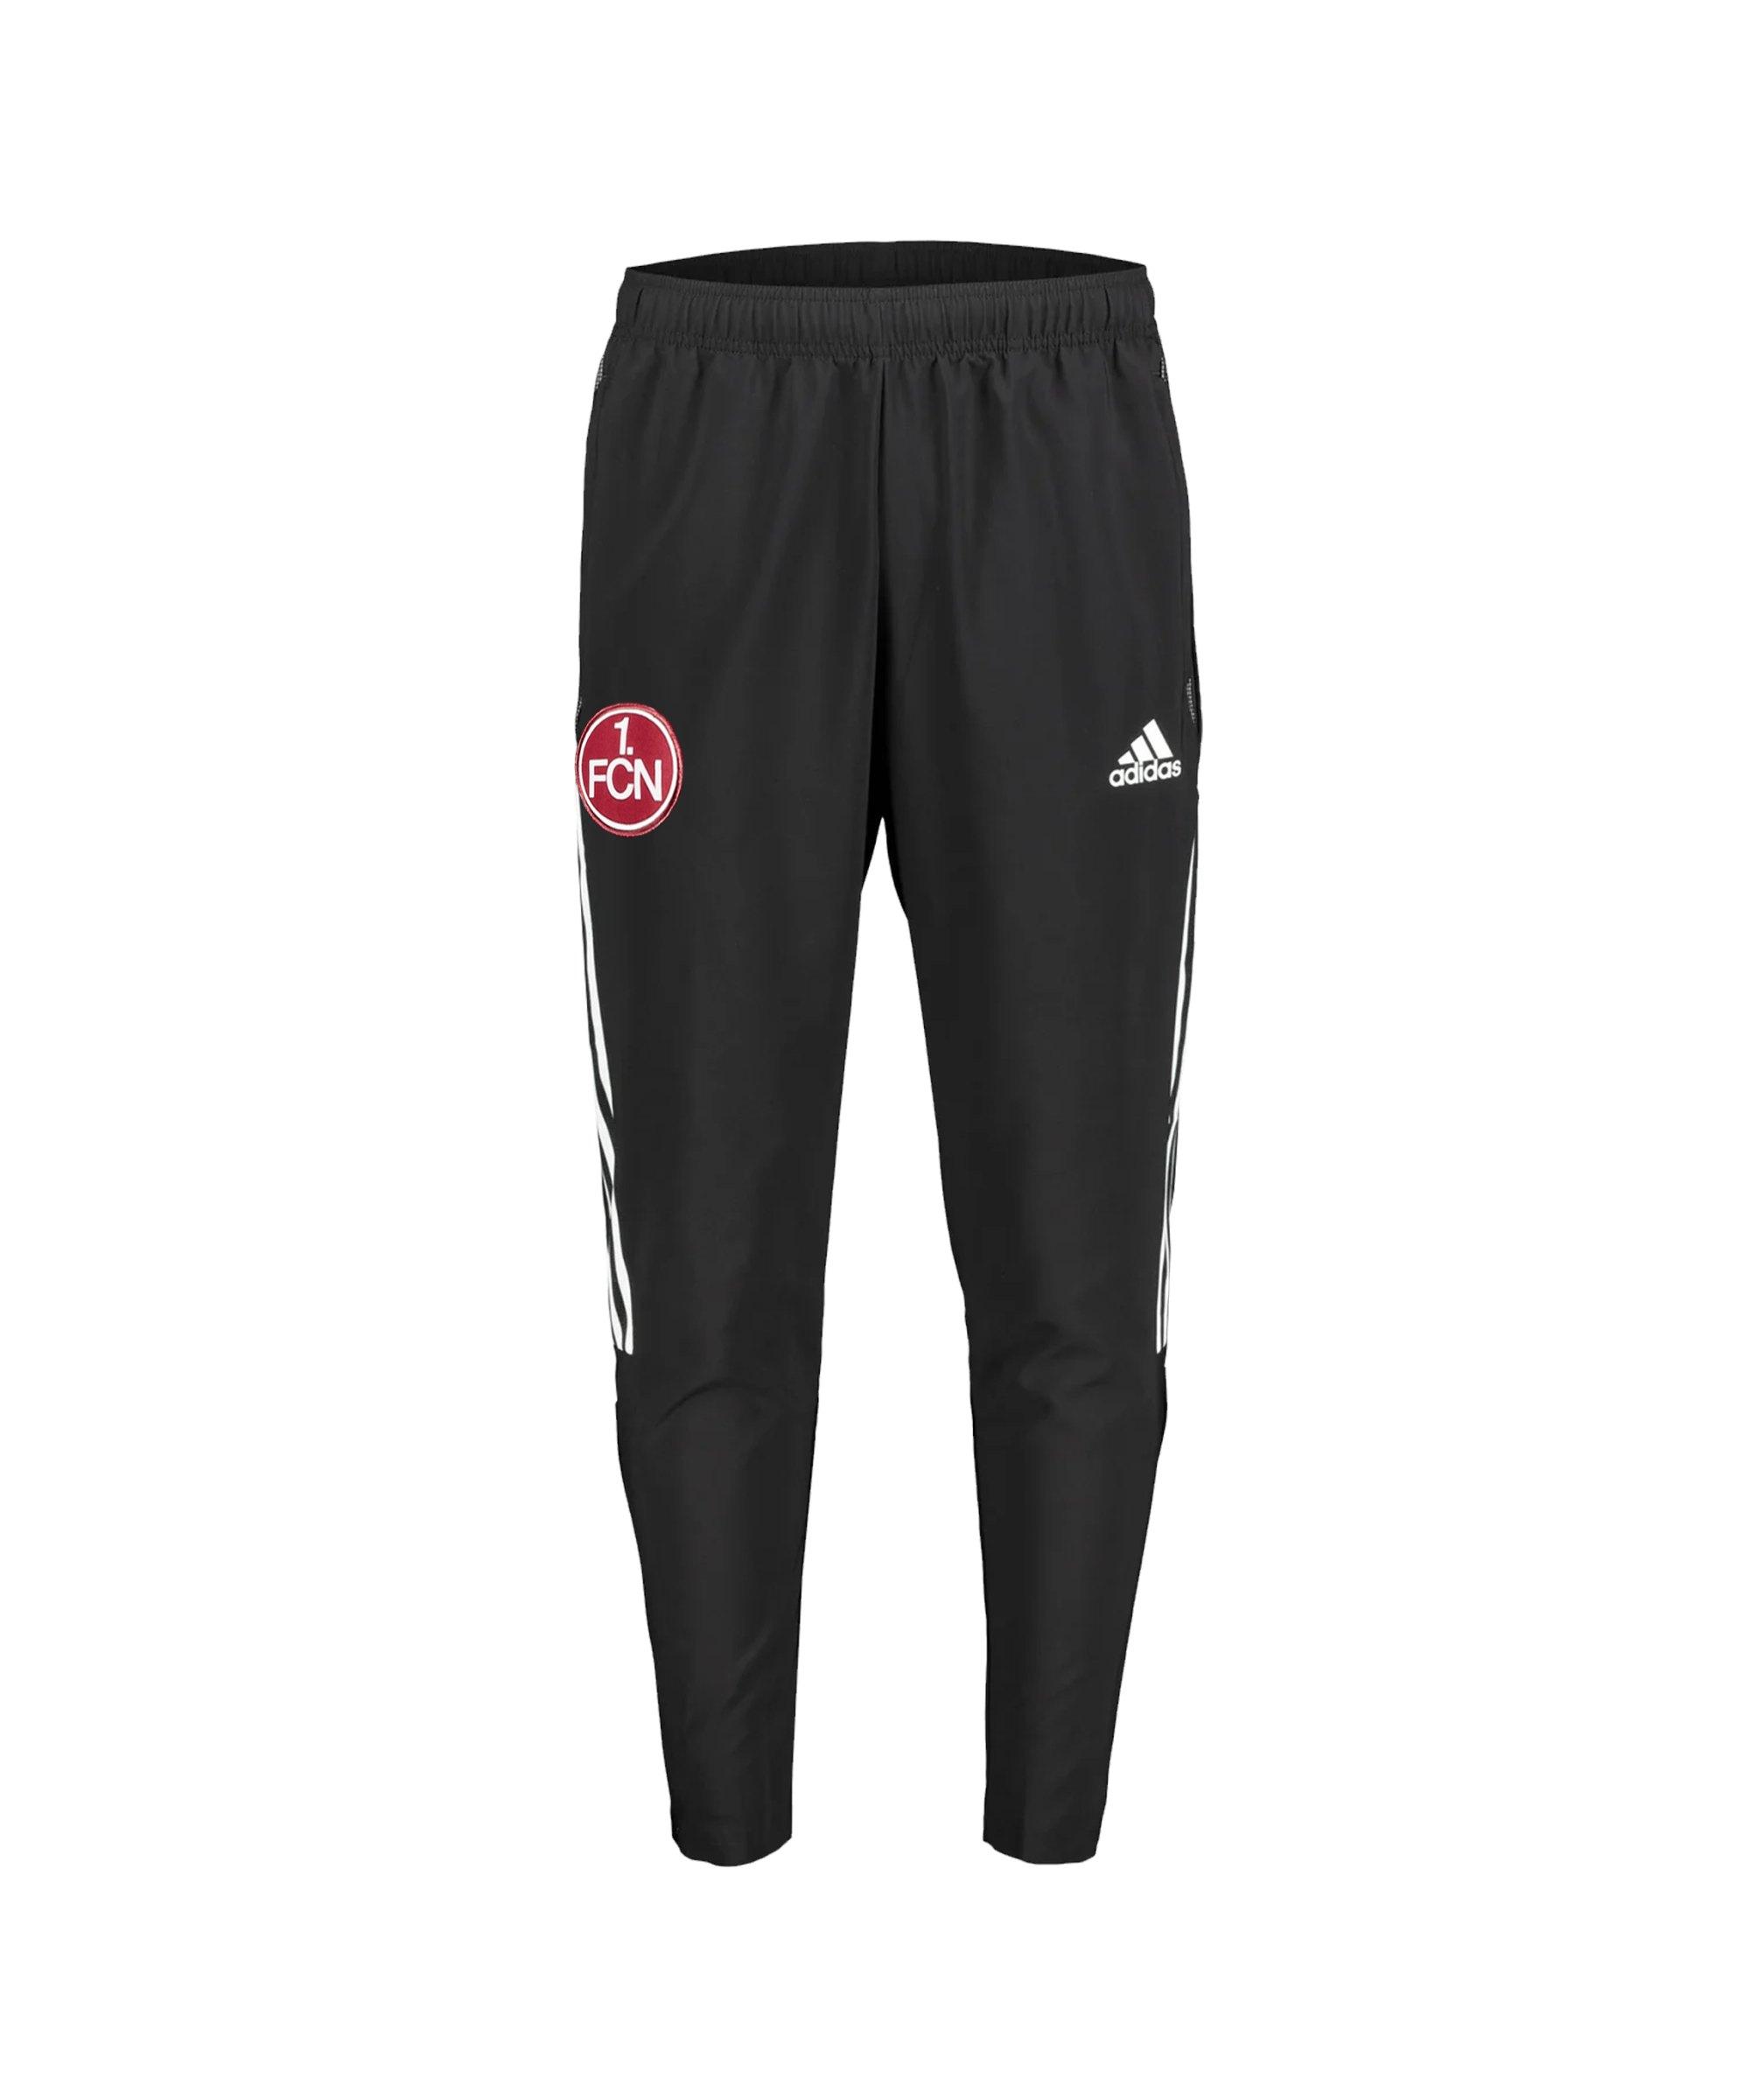 adidas 1. FC Nürnberg Trainingshose Kids Schwarz - schwarz